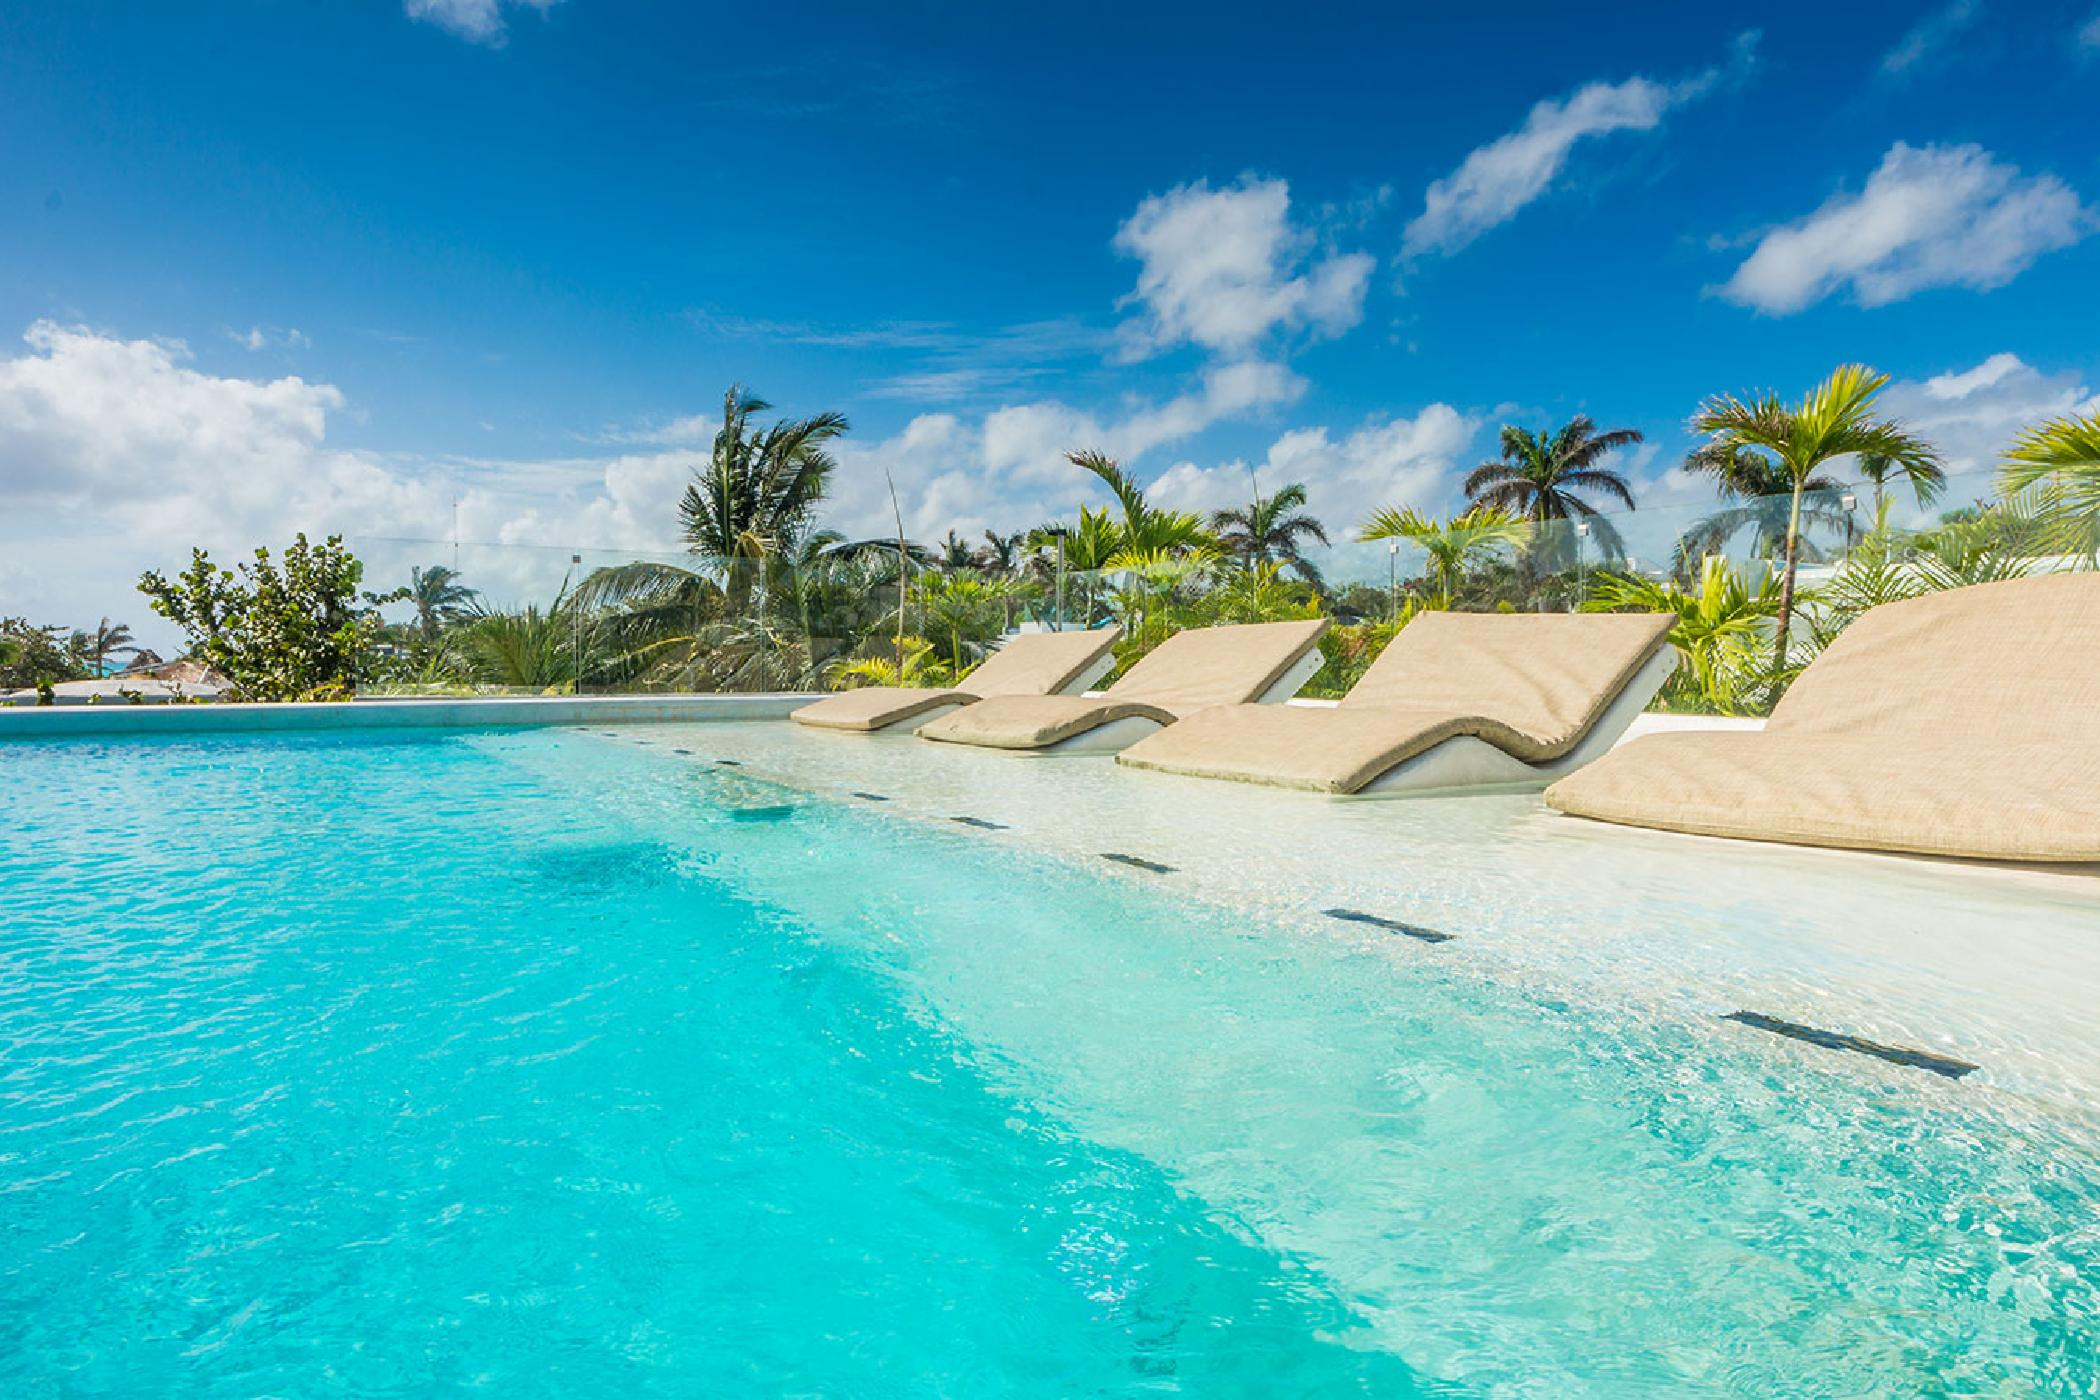 Maya_Luxe_Riviera_Maya_Luxury_Villas_Experiences_Vista_Hermosa_14.jpg